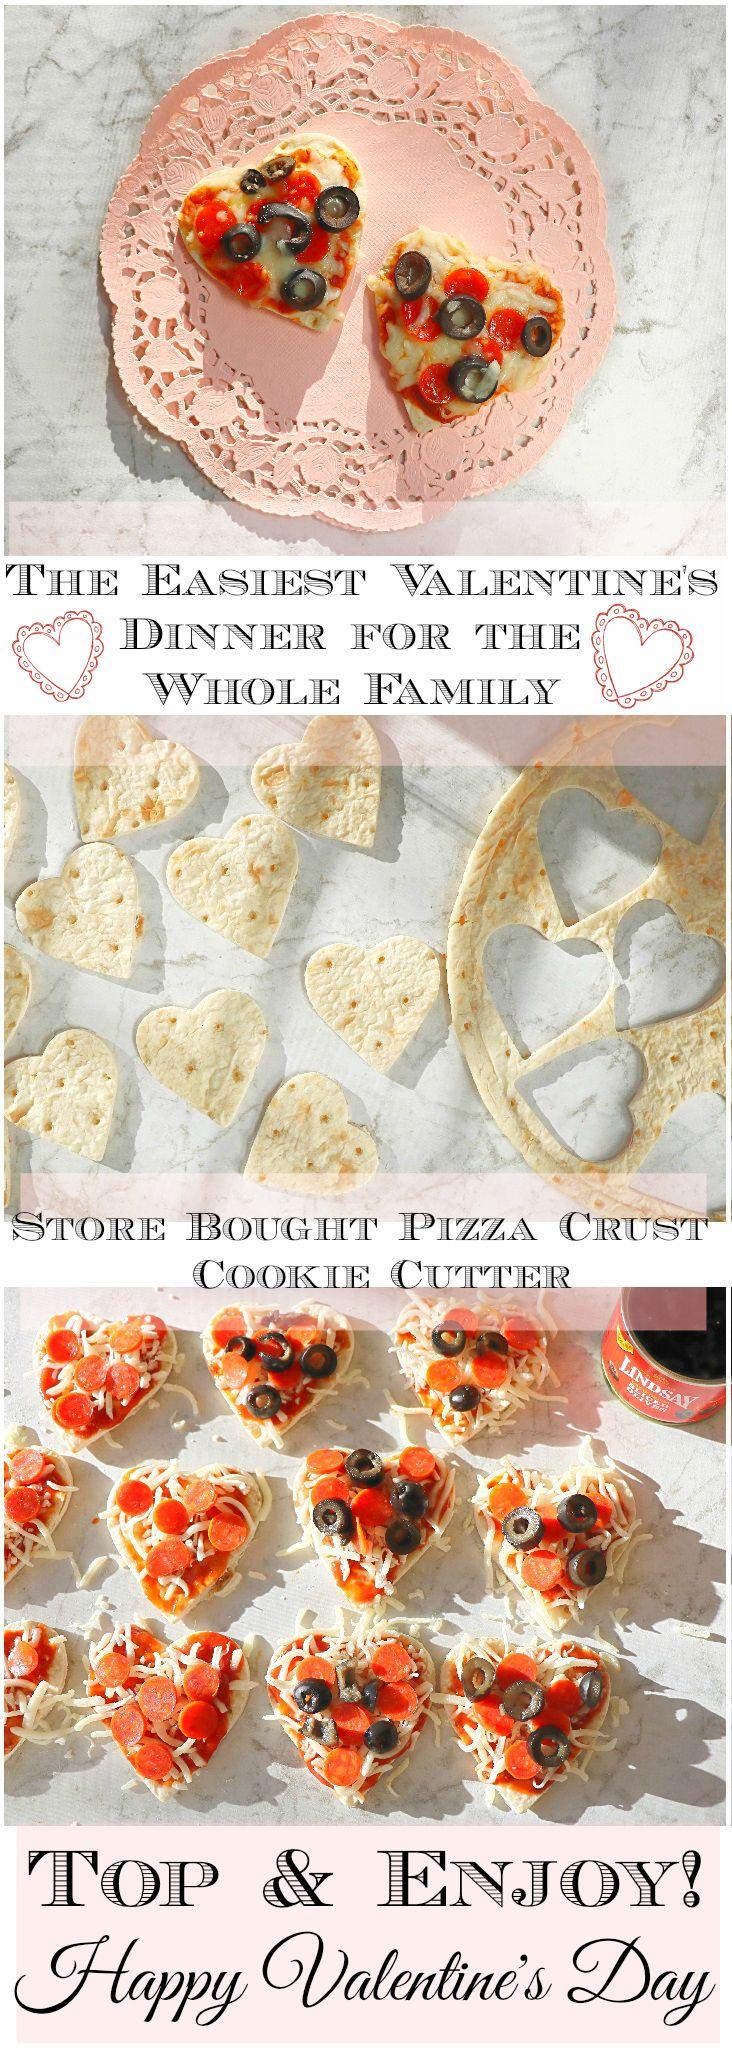 Best 25 family valentines dinner ideas on pinterest for Valentines dinner for kids